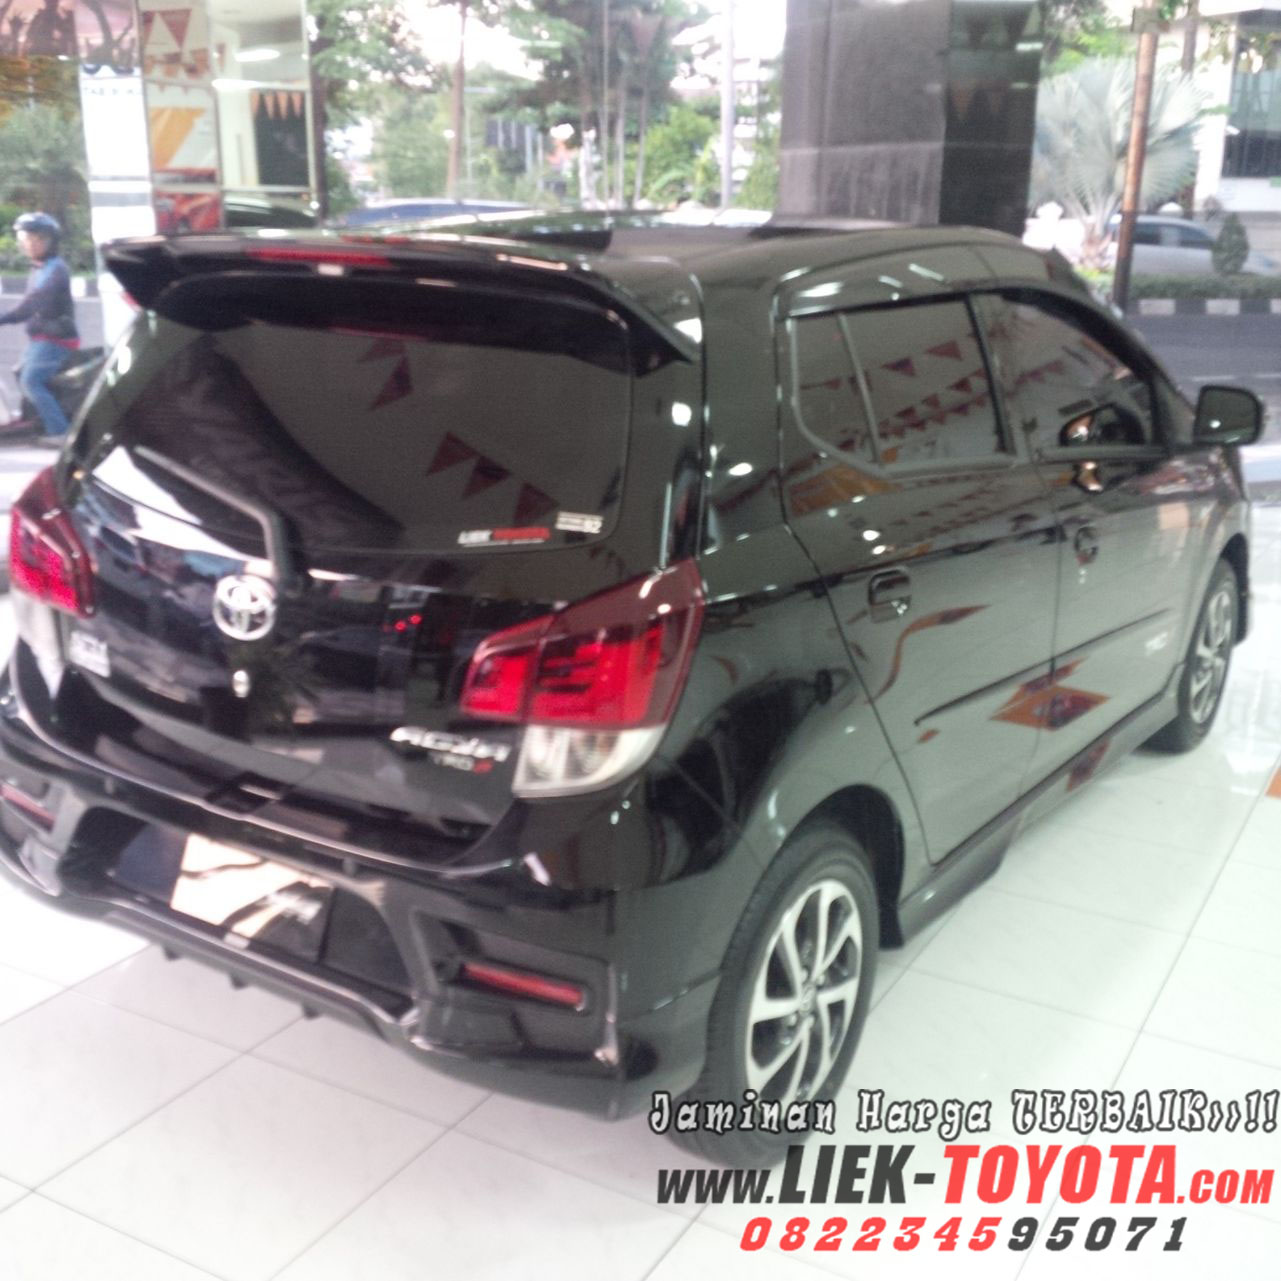 new agya trd hitam all kijang innova 2.4 g a/t diesel lux gambar modifikasi mobil sobat harga toyota liek hub 082234595071